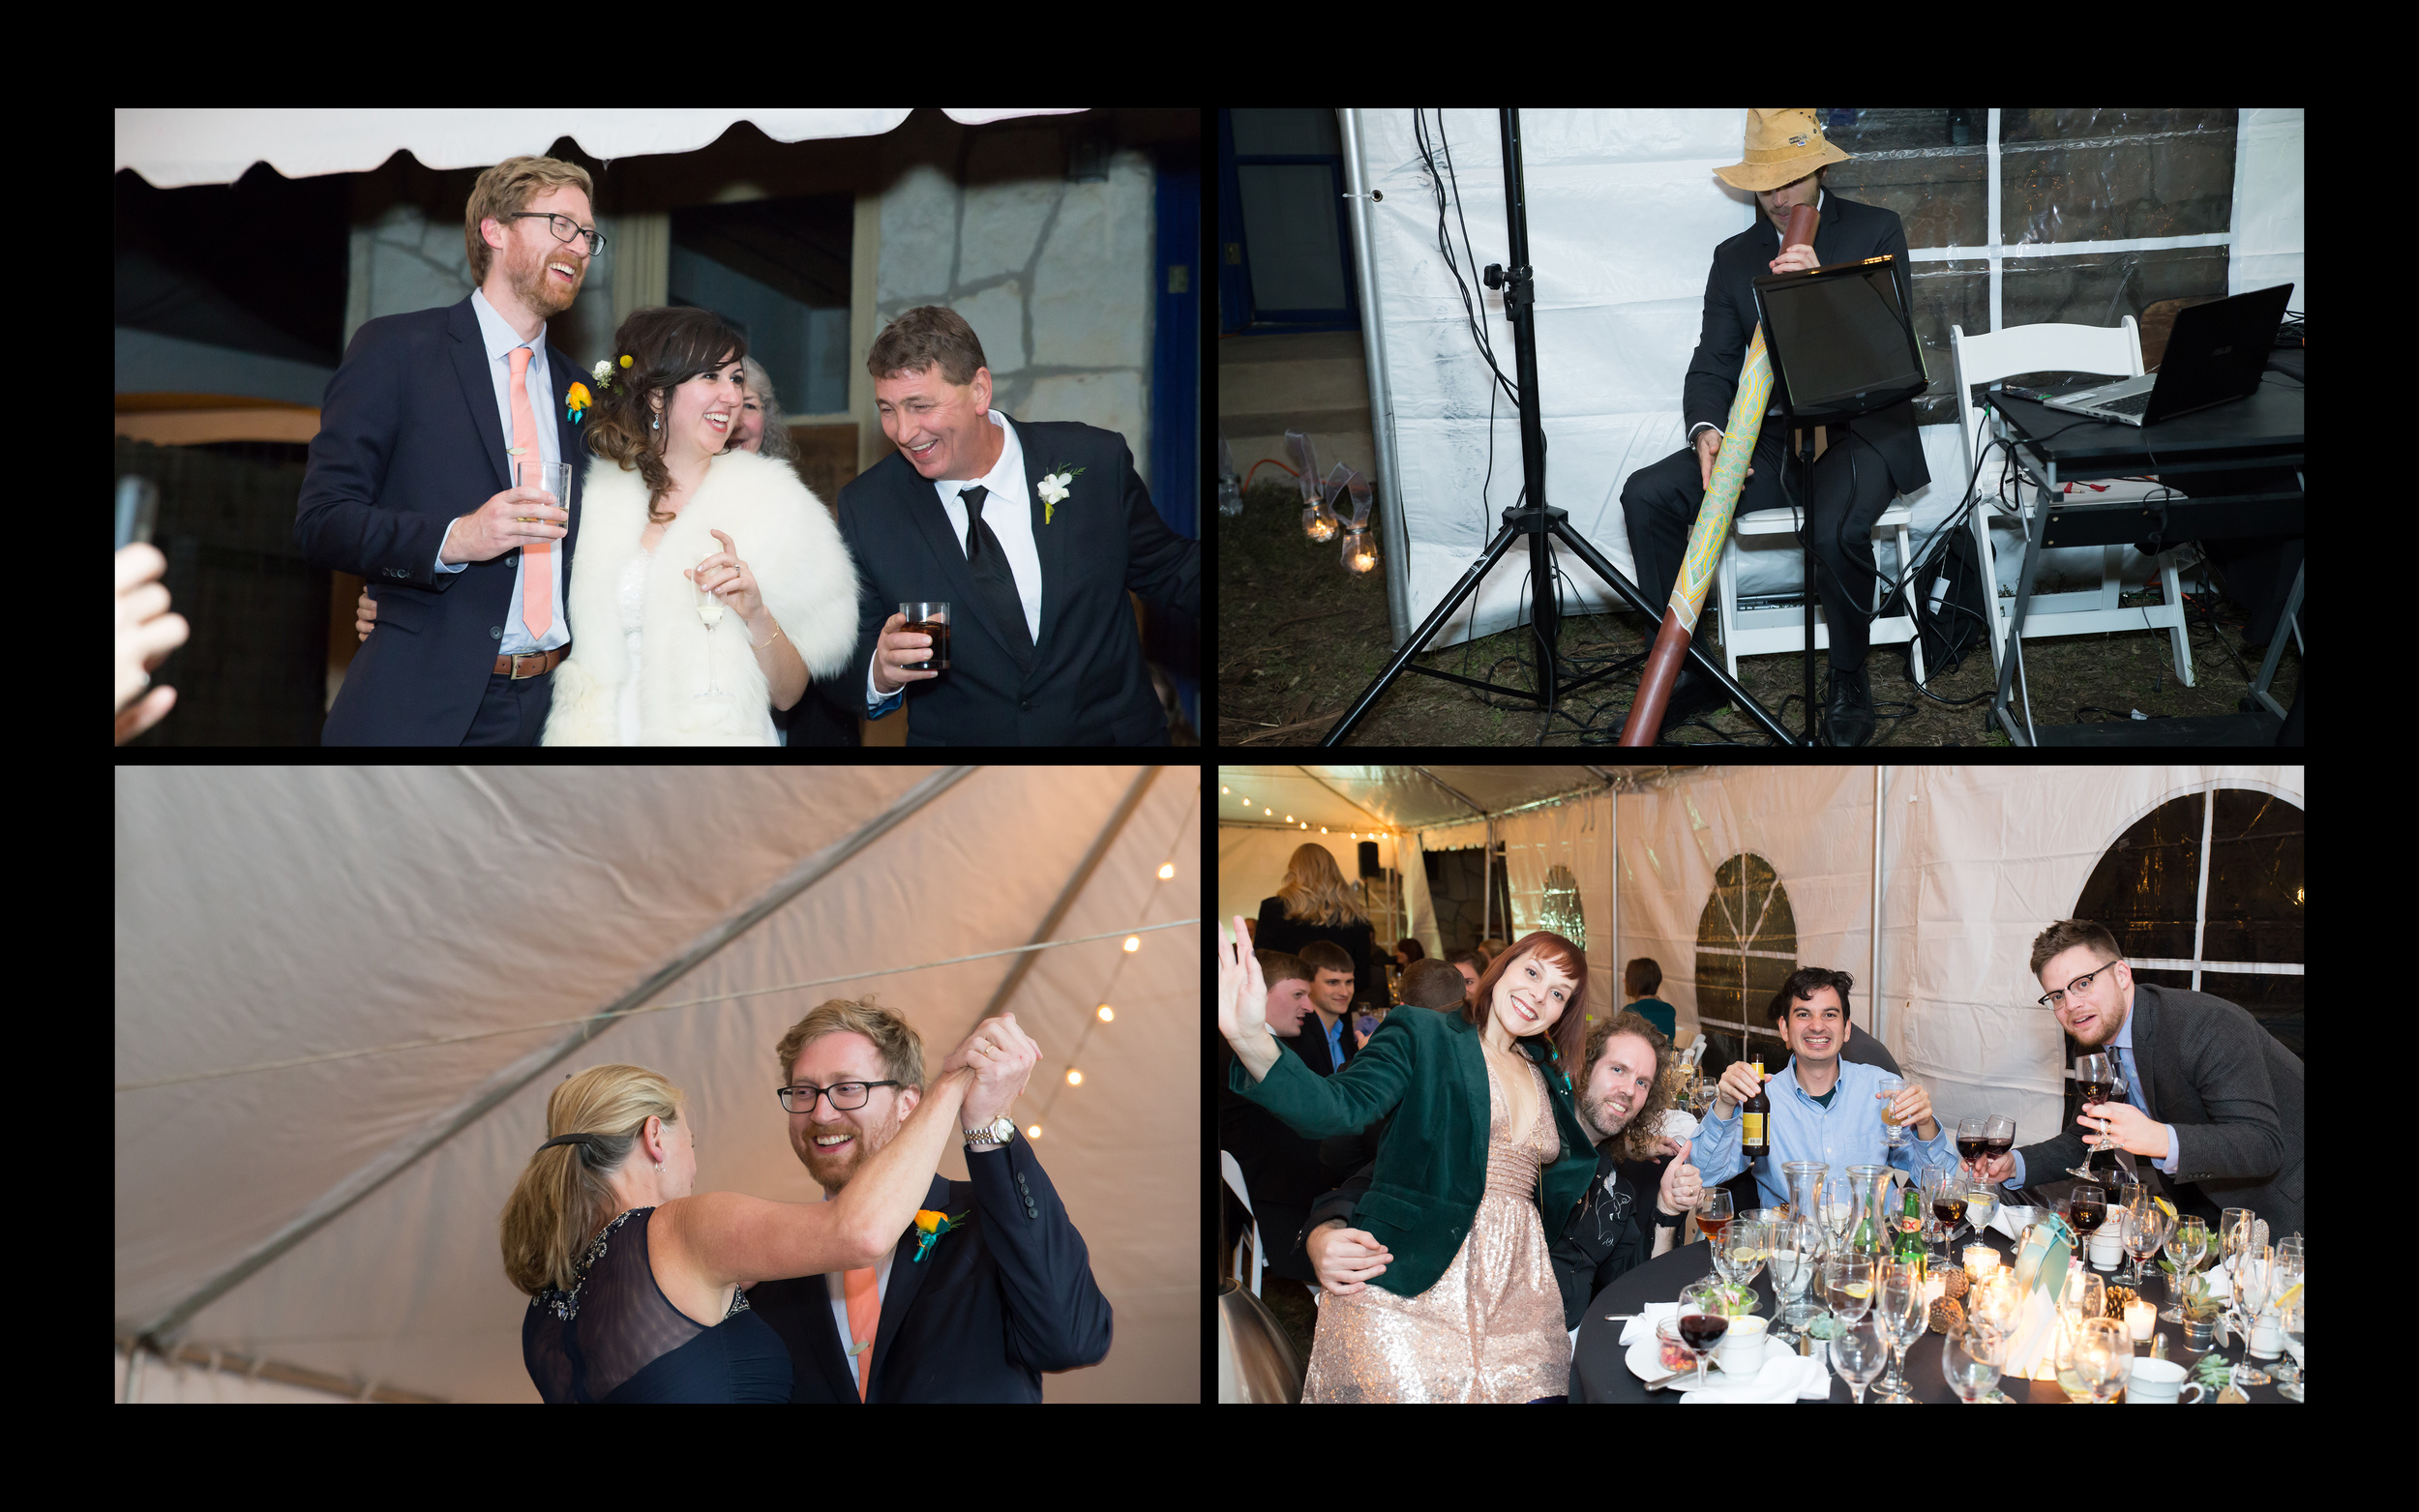 Austin_wedding_photographer_jolo8